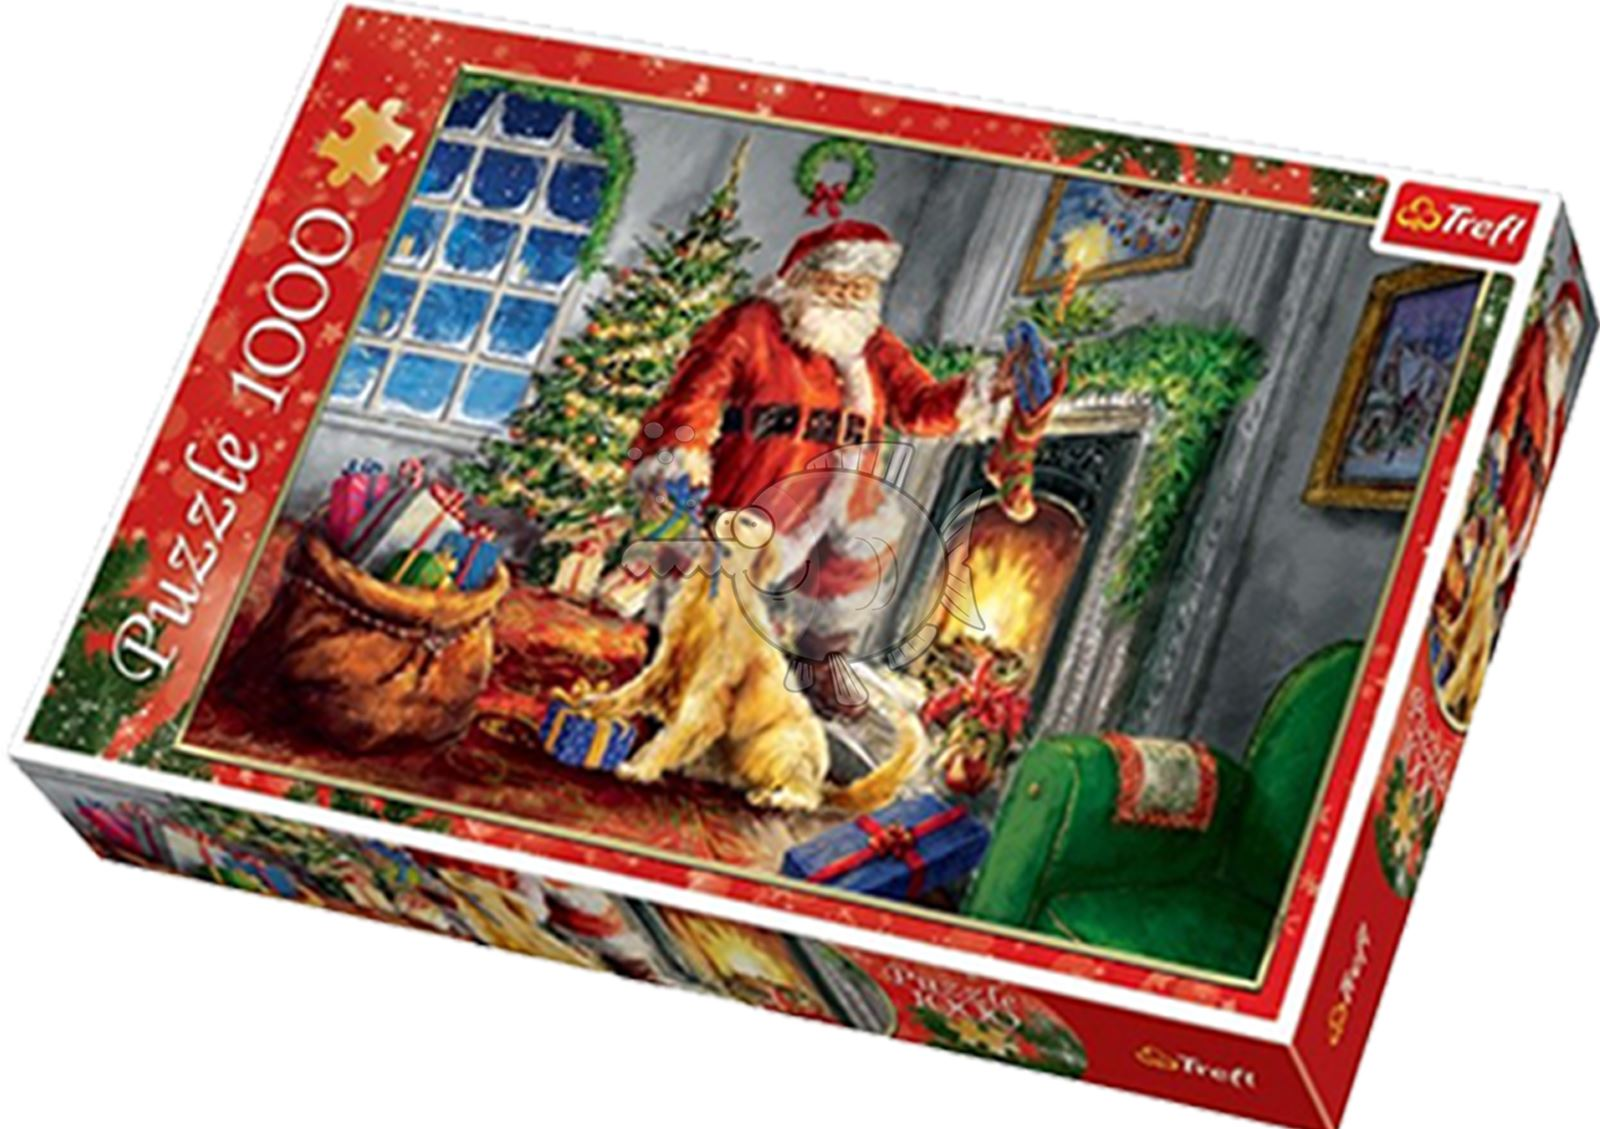 Trefl-300-500-1000-1500-2000-3000-4000-6000-Piece-Jigsaw-Puzzle-Landscapes-City thumbnail 77